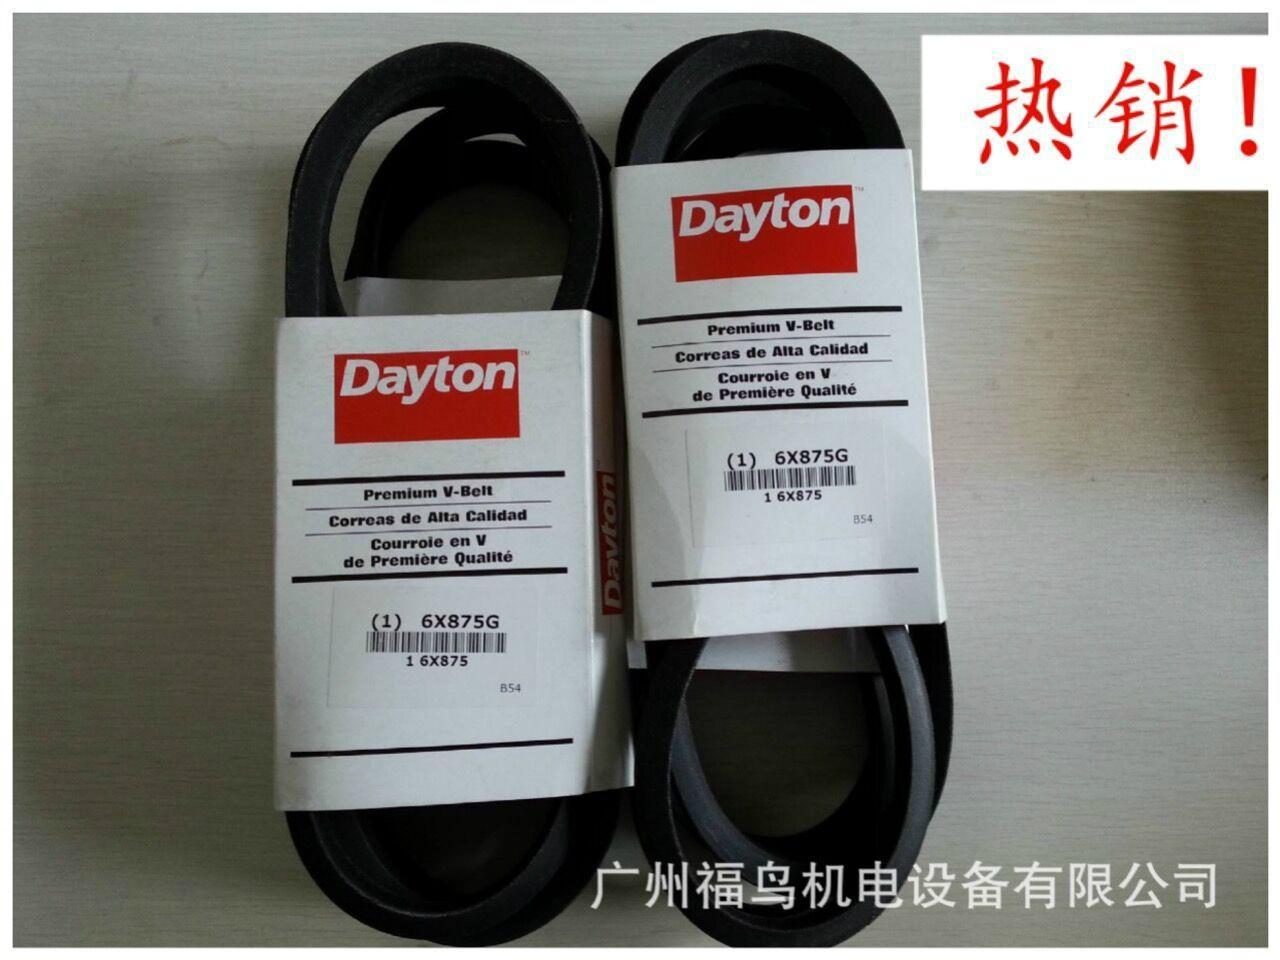 DAYTON皮带  型号: 6X875, 6X875G